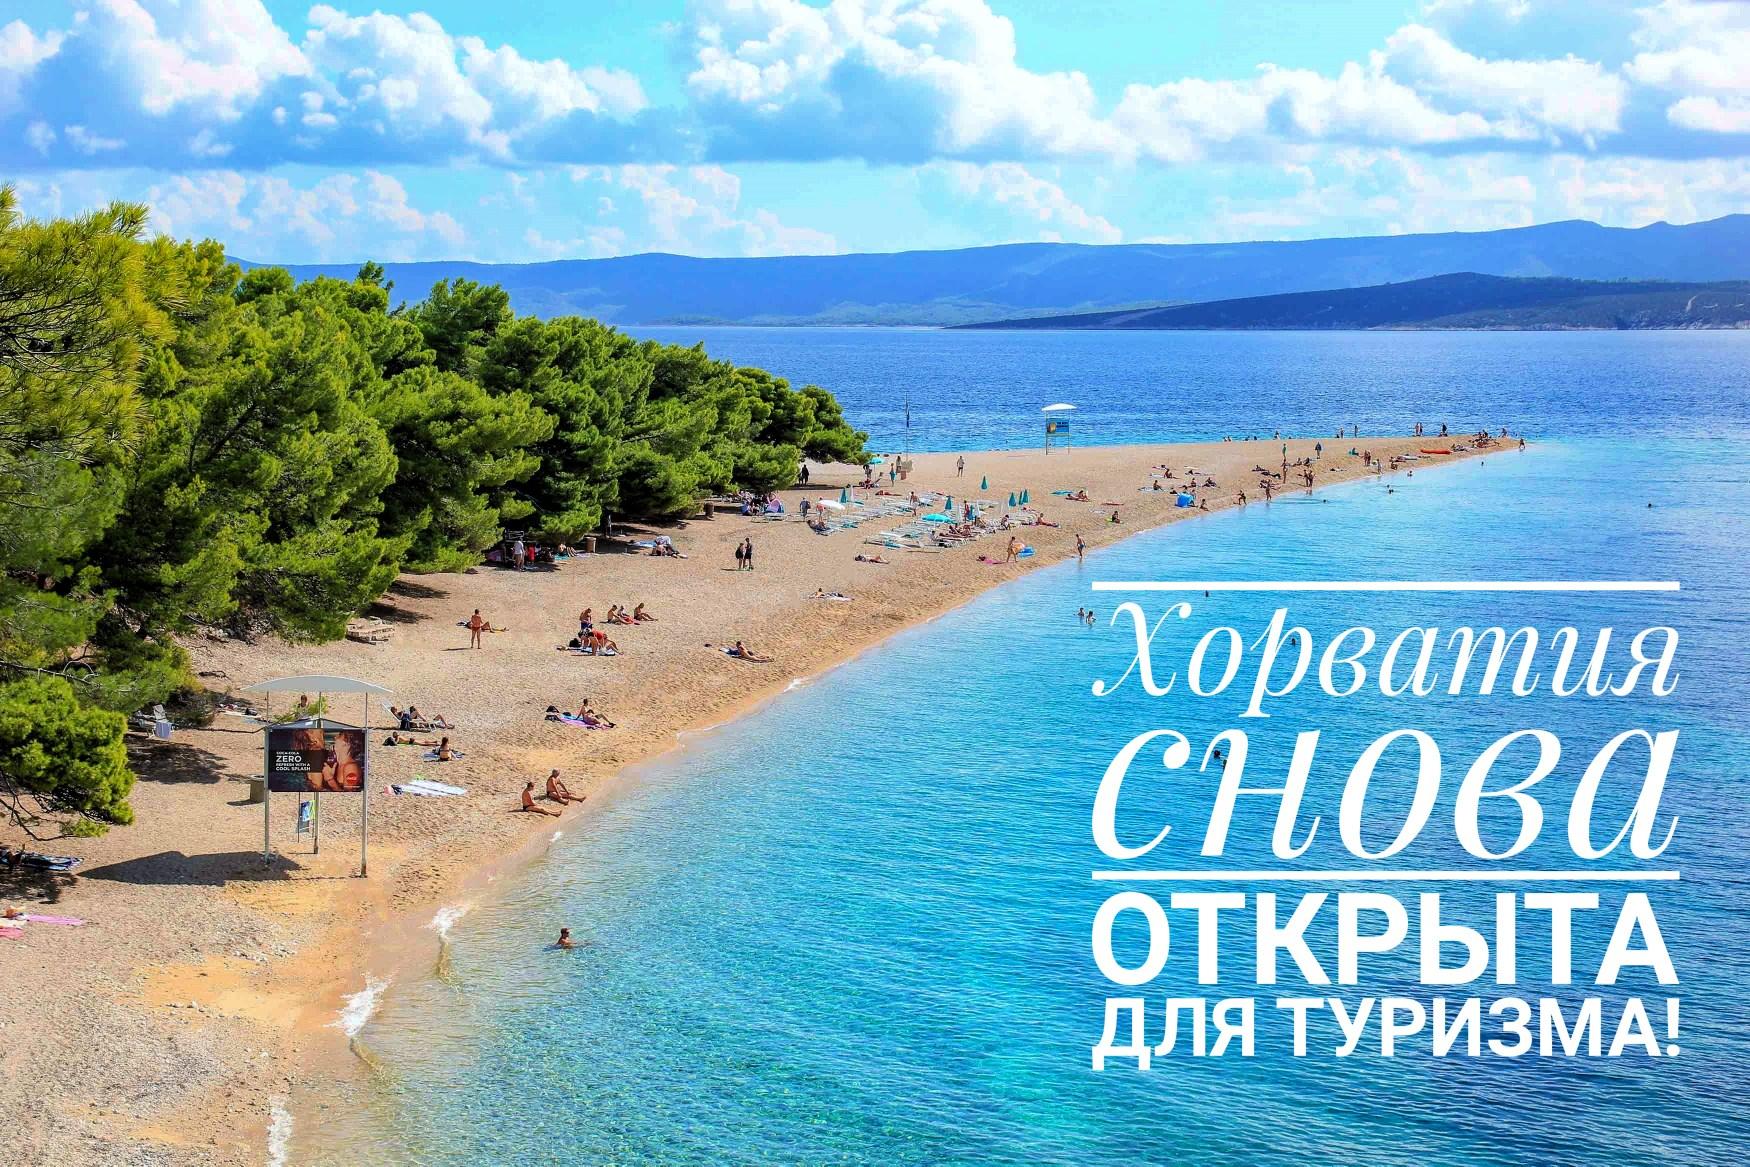 Хорватия снова открыта для туризма